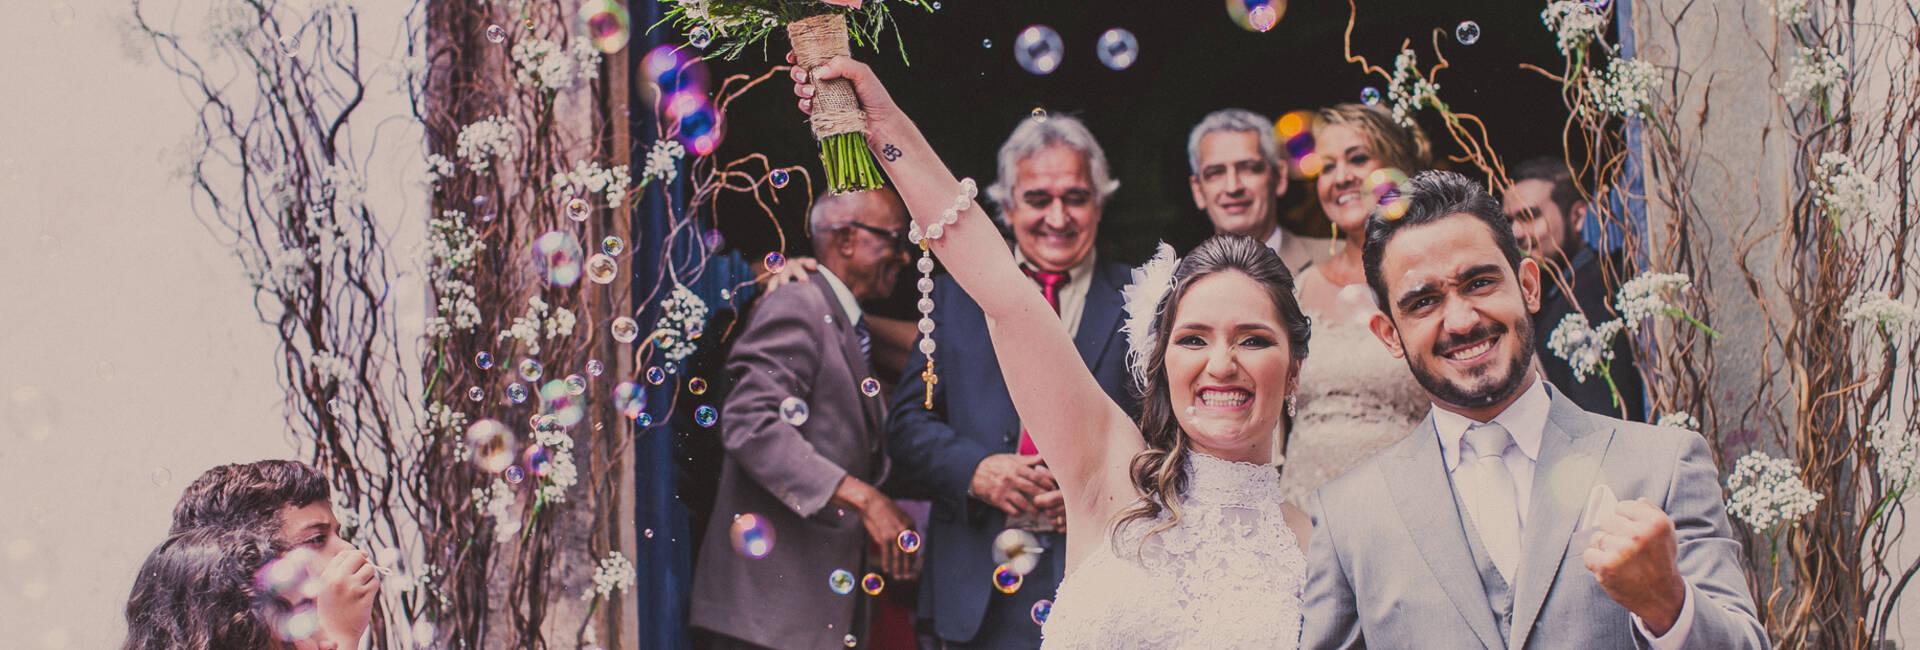 Trailer de Casamento de Lorena e Gustavo